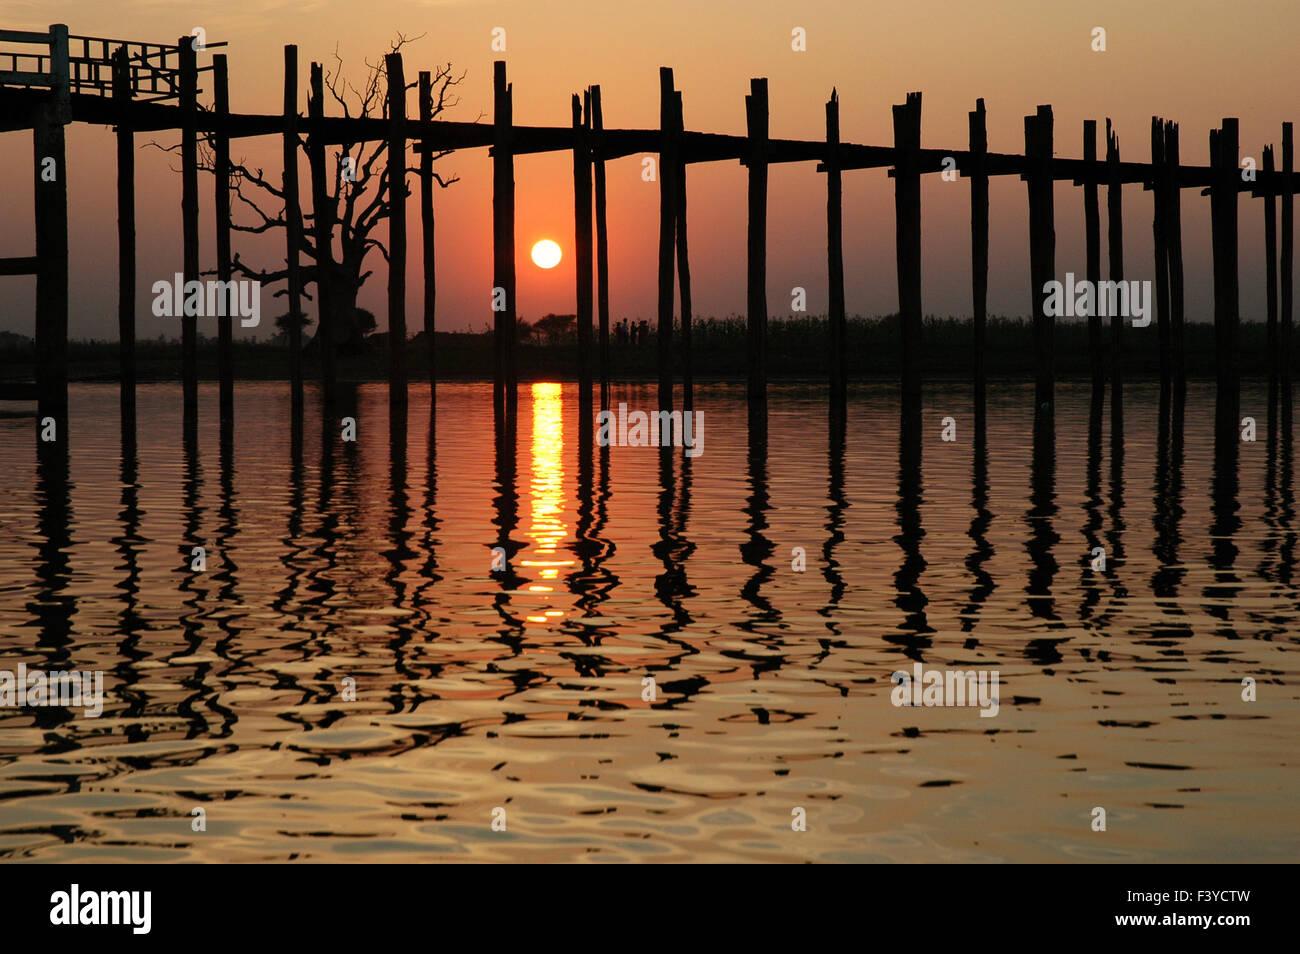 U Bein Brücke Reflexion ohne Menschen bei Sonnenuntergang, Amarapura, Mandalay, Myanmar Stockbild